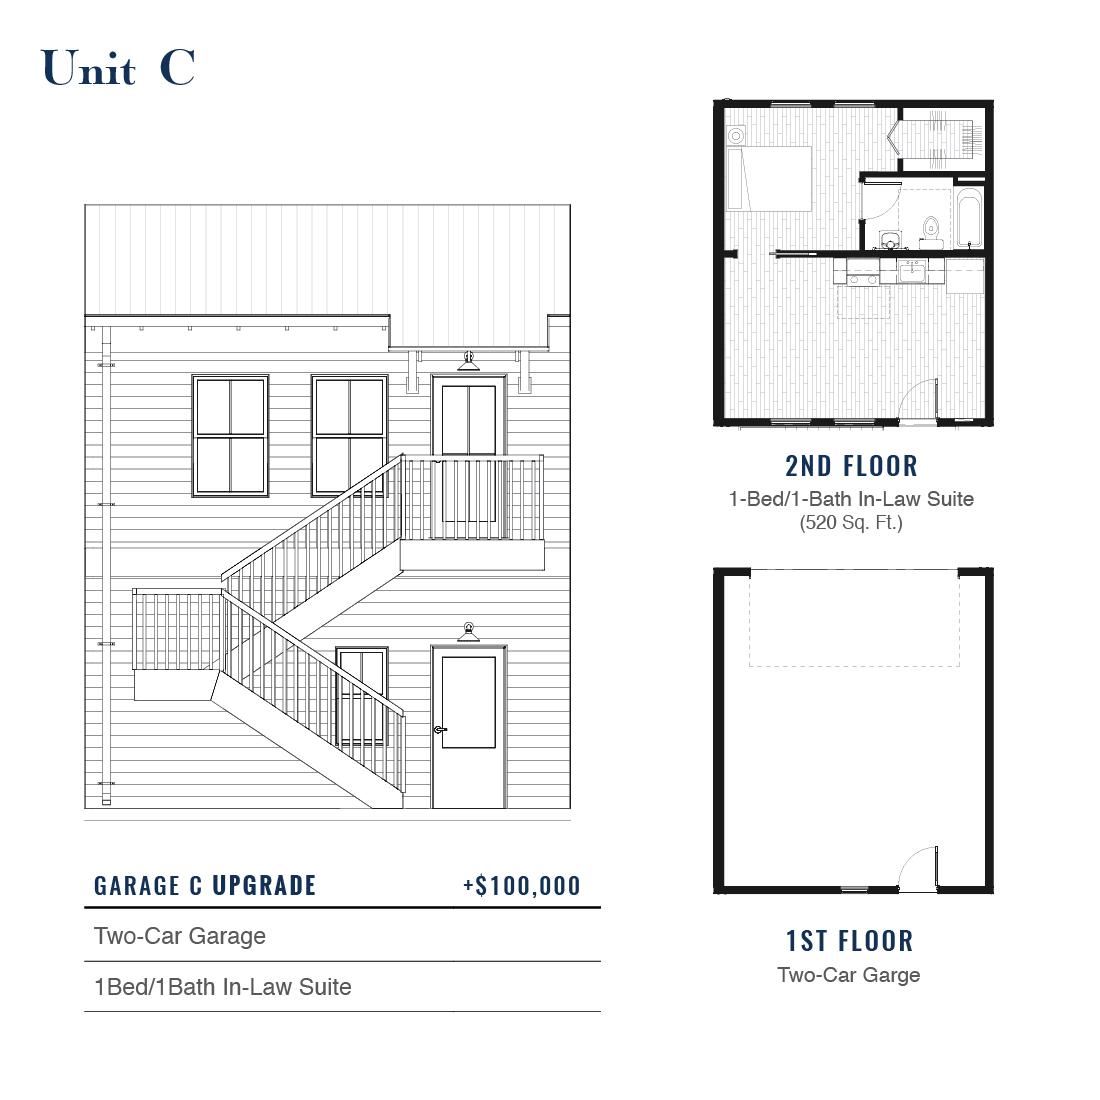 Unit C Premium Garage with ADU   East Wilbur LiveWorks, Downtown Lake Mary